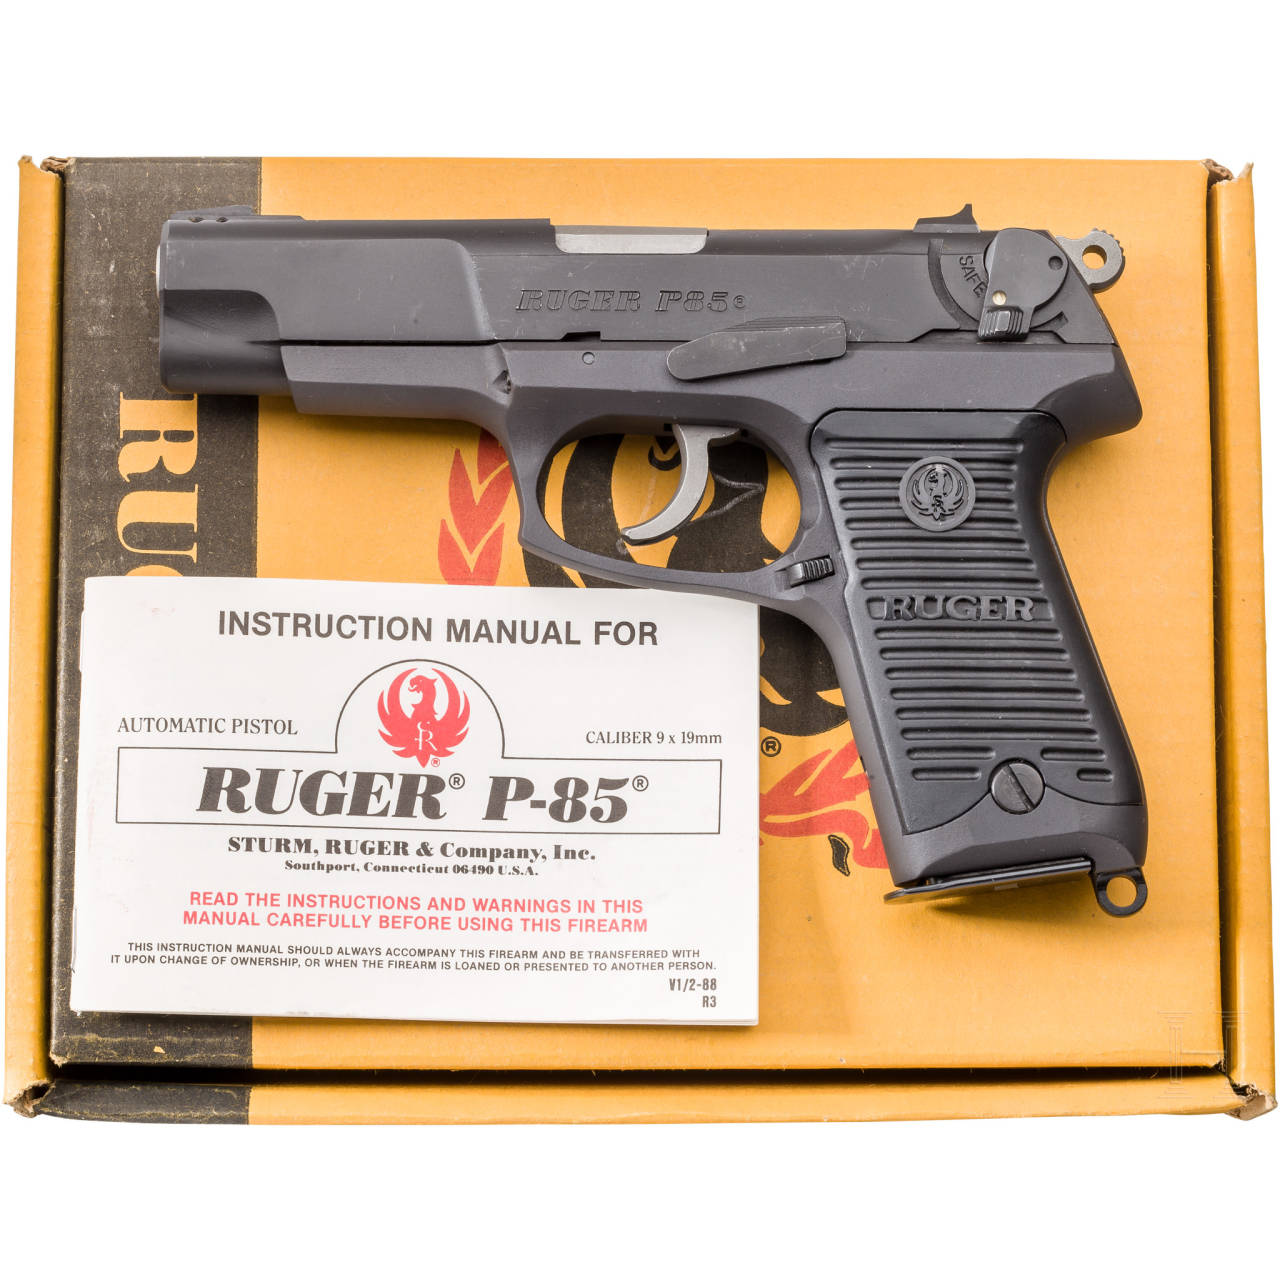 Ruger P 85, im Karton